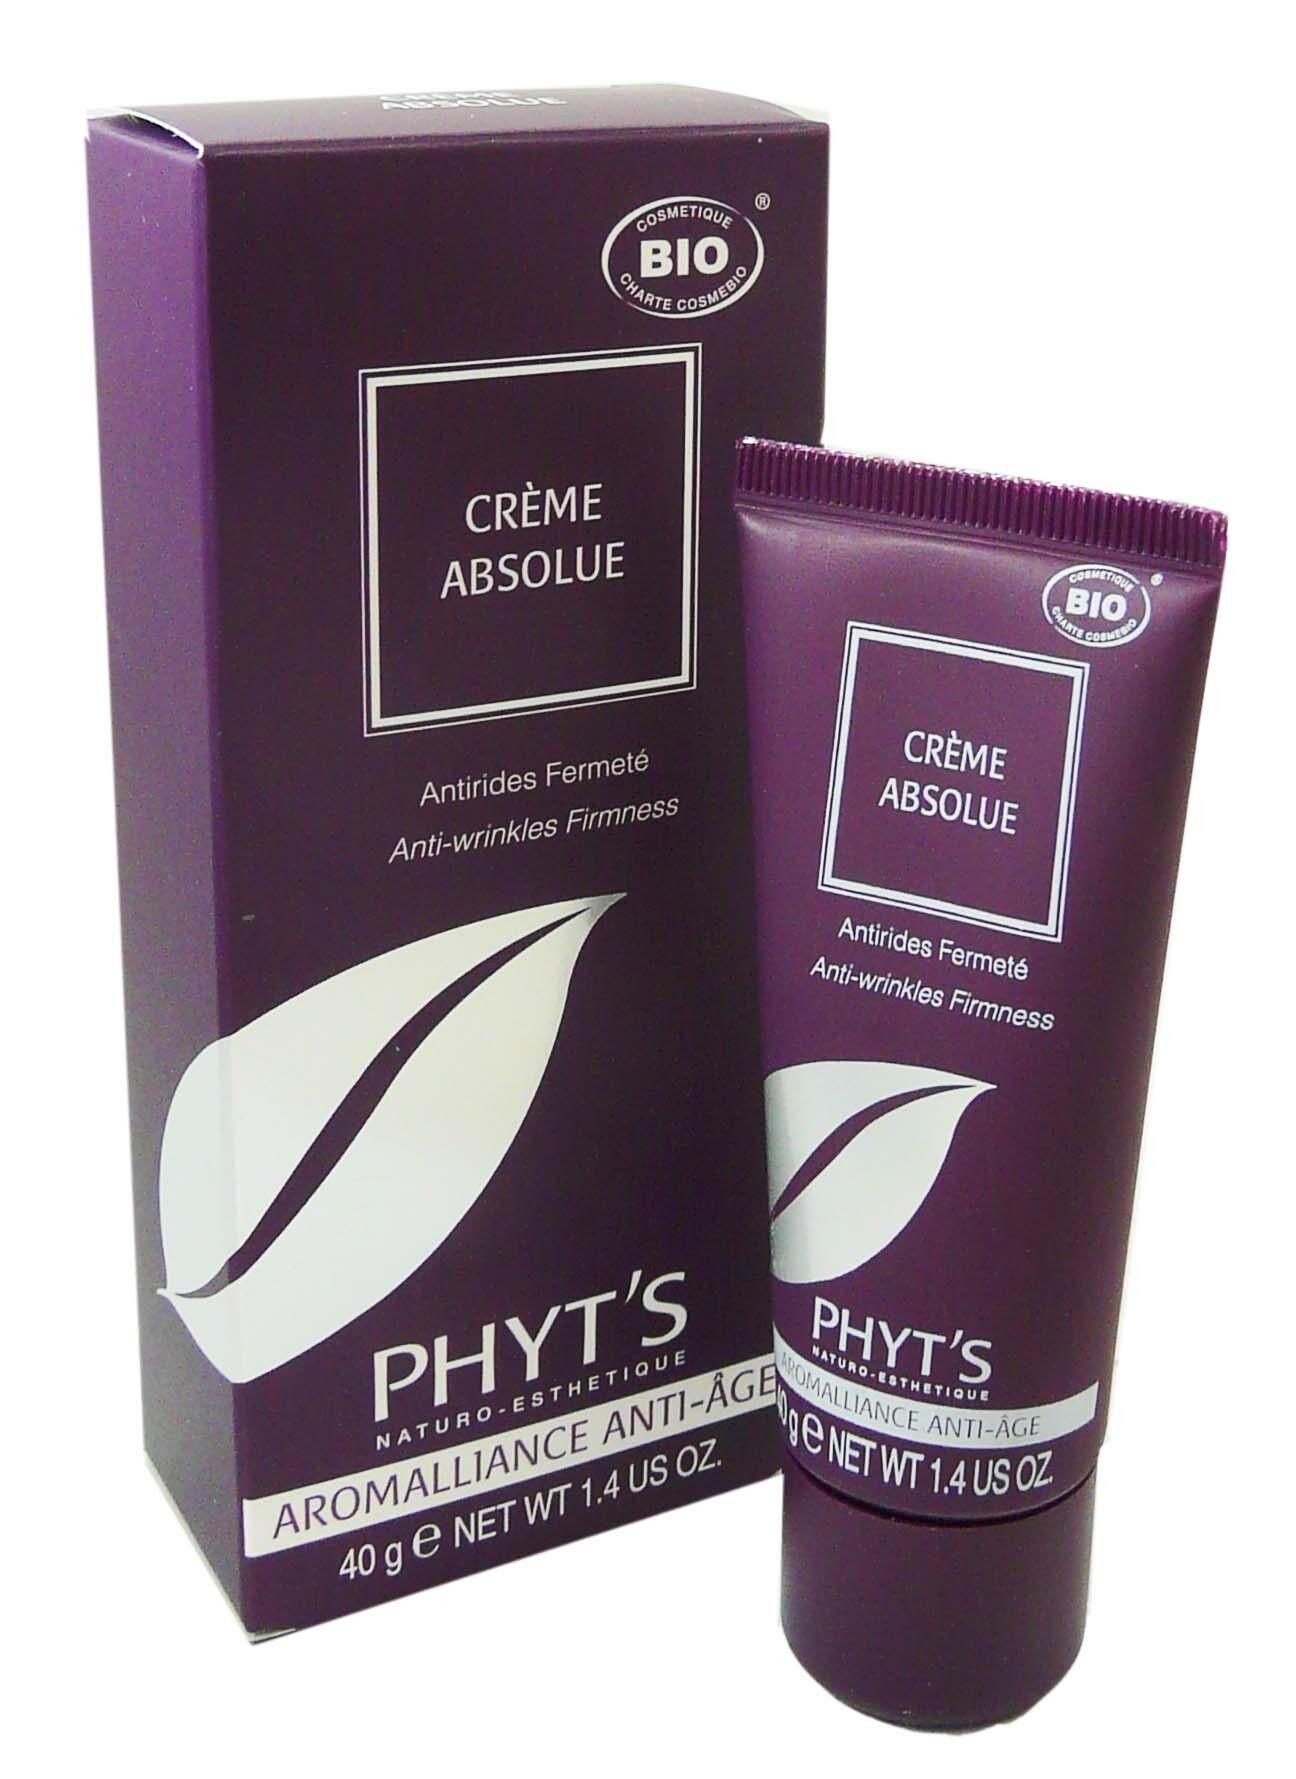 Phyt's aromalliance creme absolue anti rides 40g